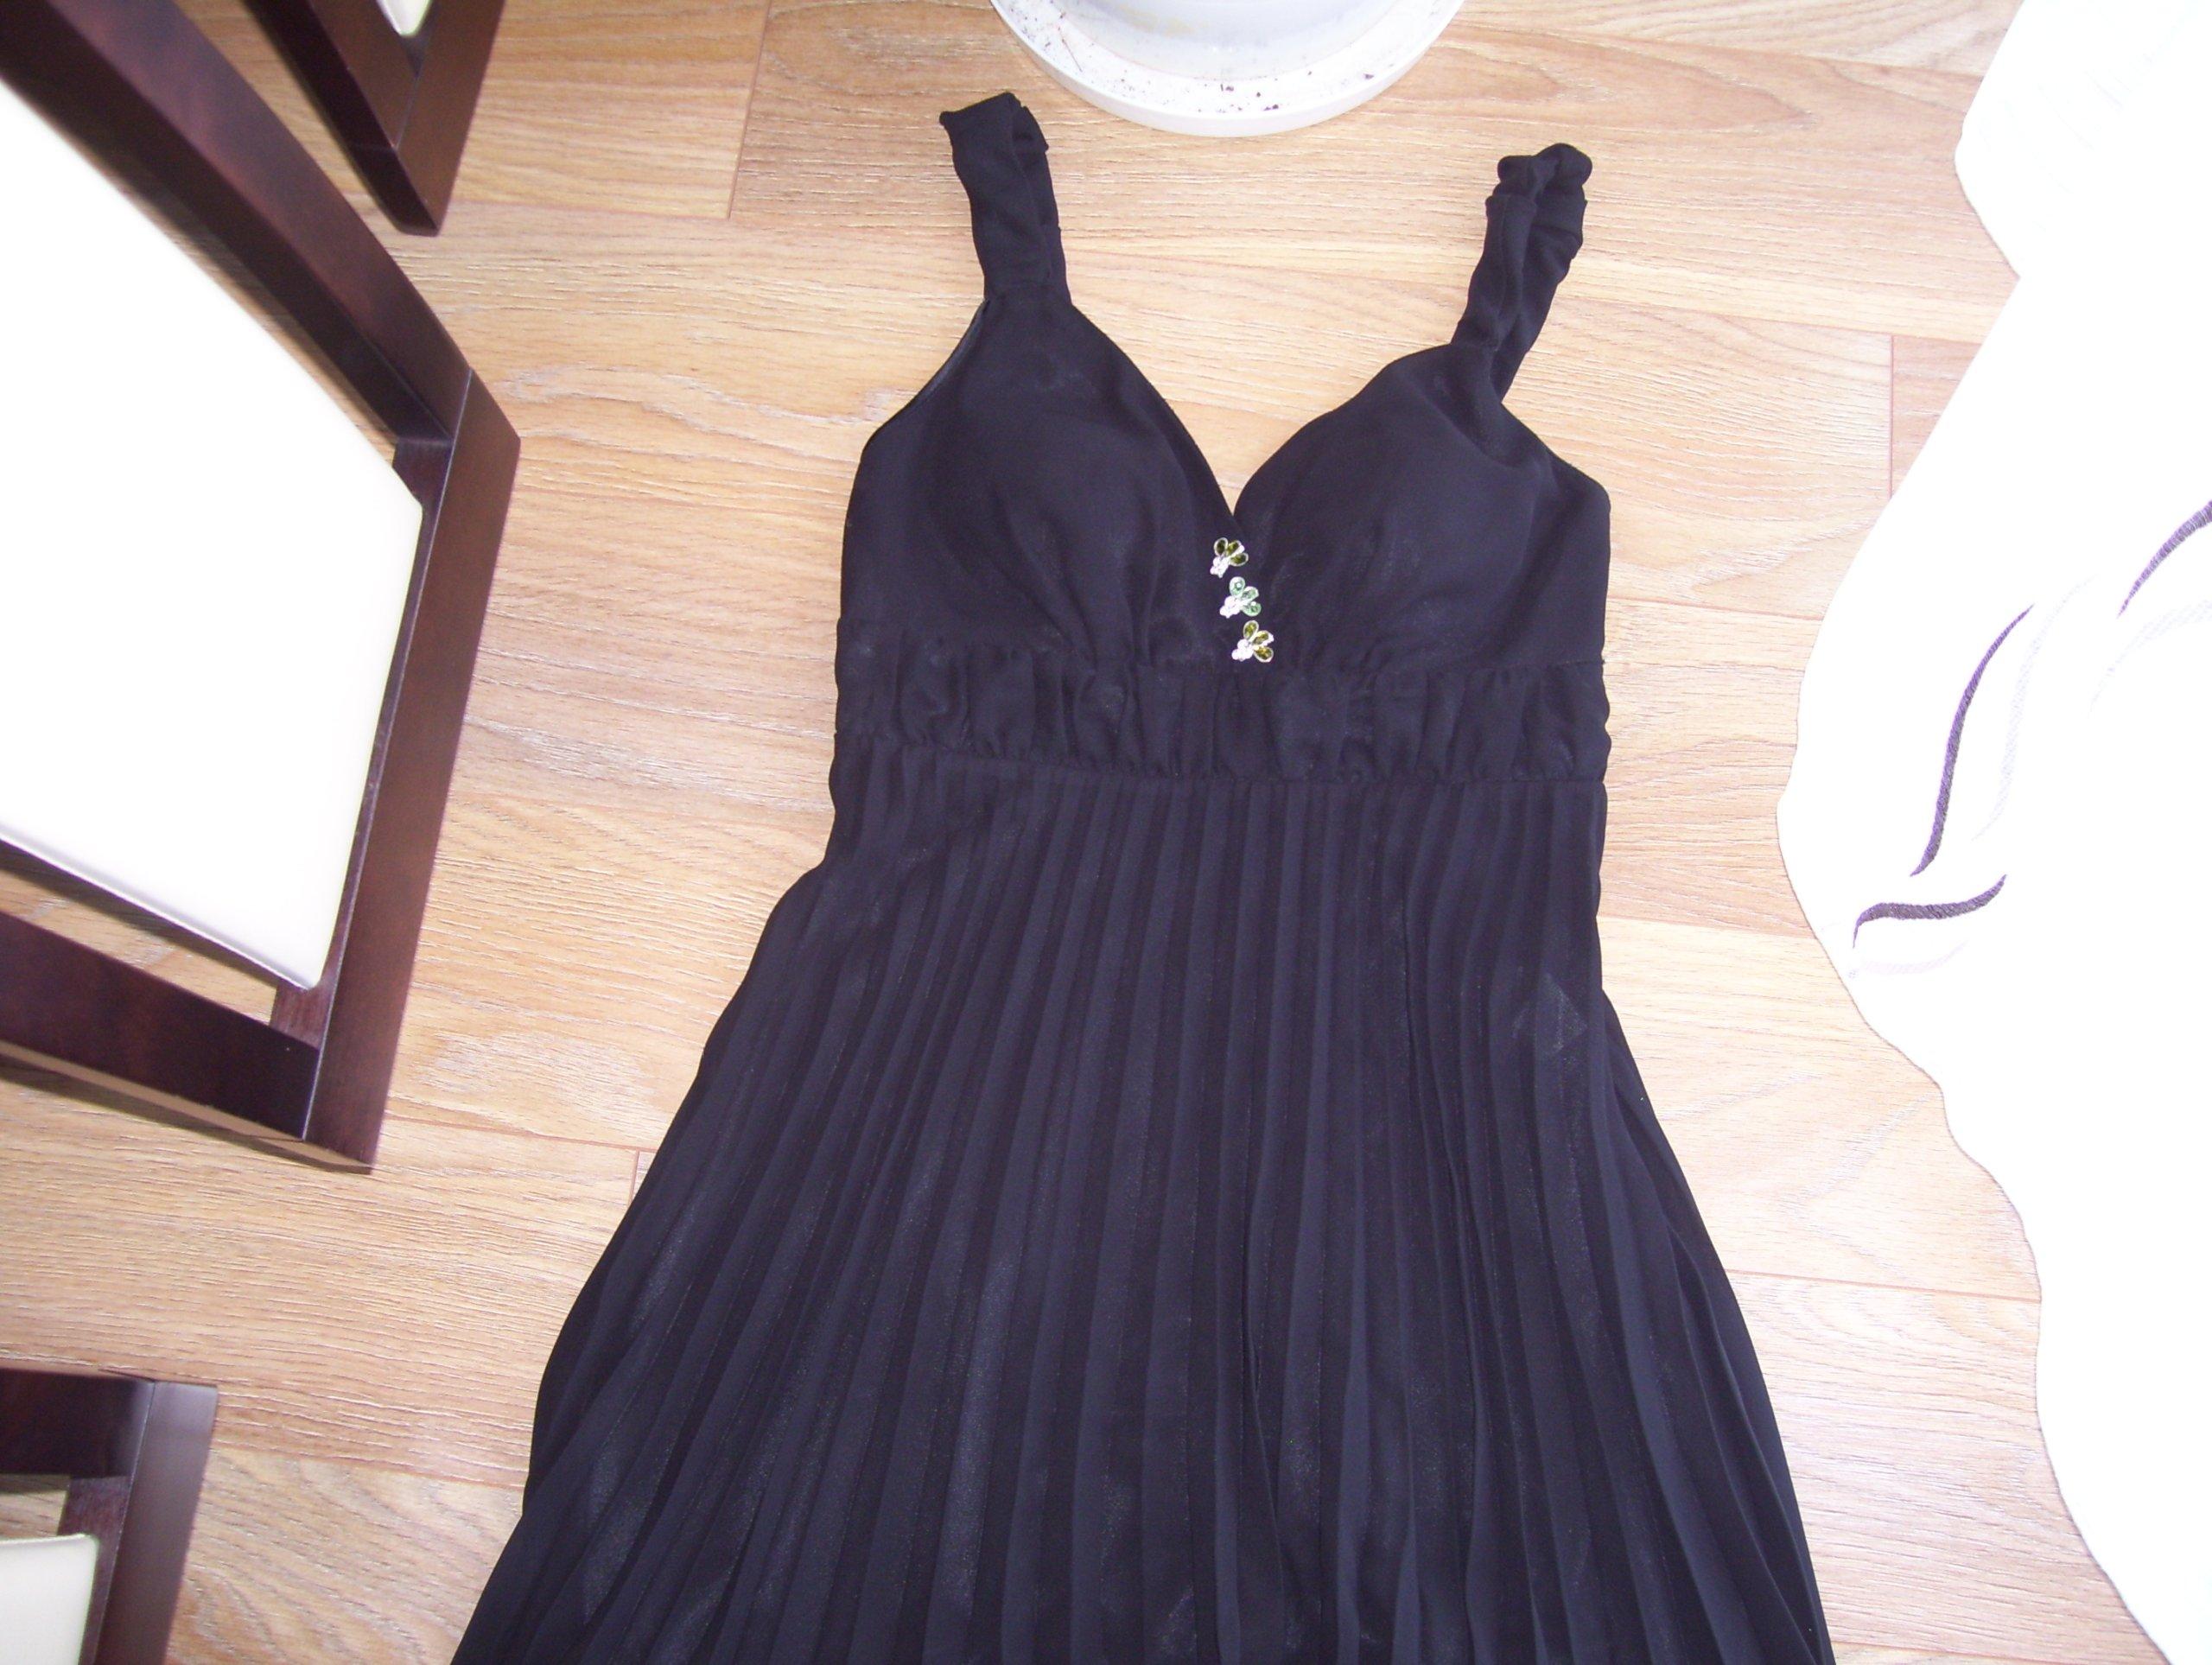 ebf6e11bcf Piękna sukienka wesele sylwester reserved 38 - 7042962815 ...